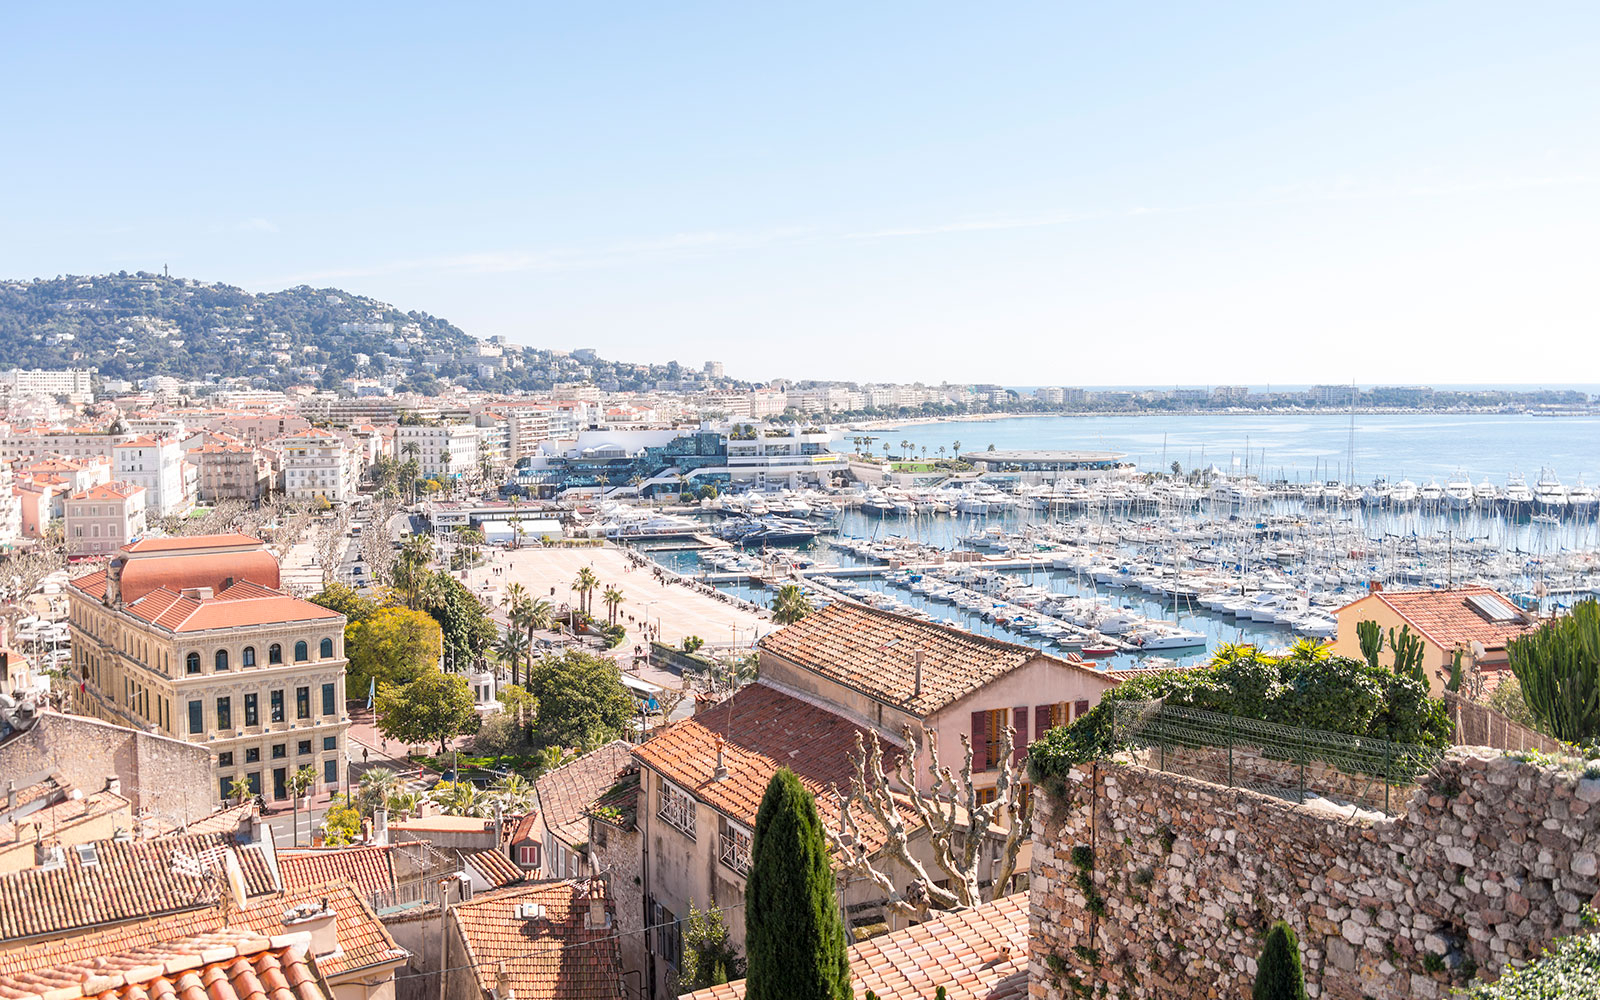 Cannes skyline